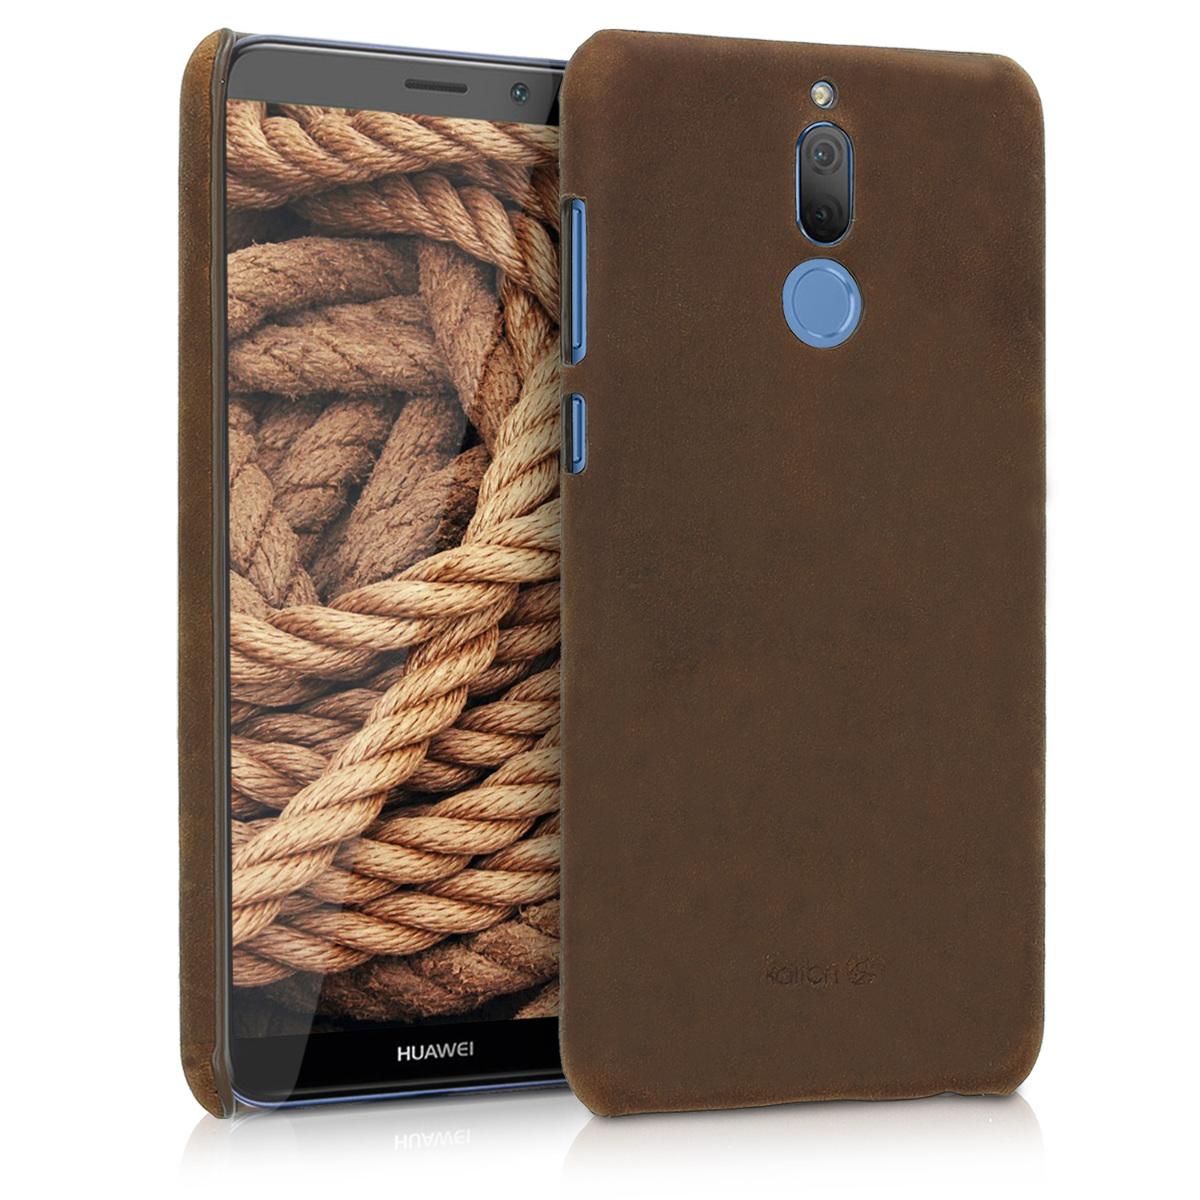 Kalibri Σκληρή Δερμάτινη Θήκη Huawei Mate 10 Lite - Brown (44901.05)